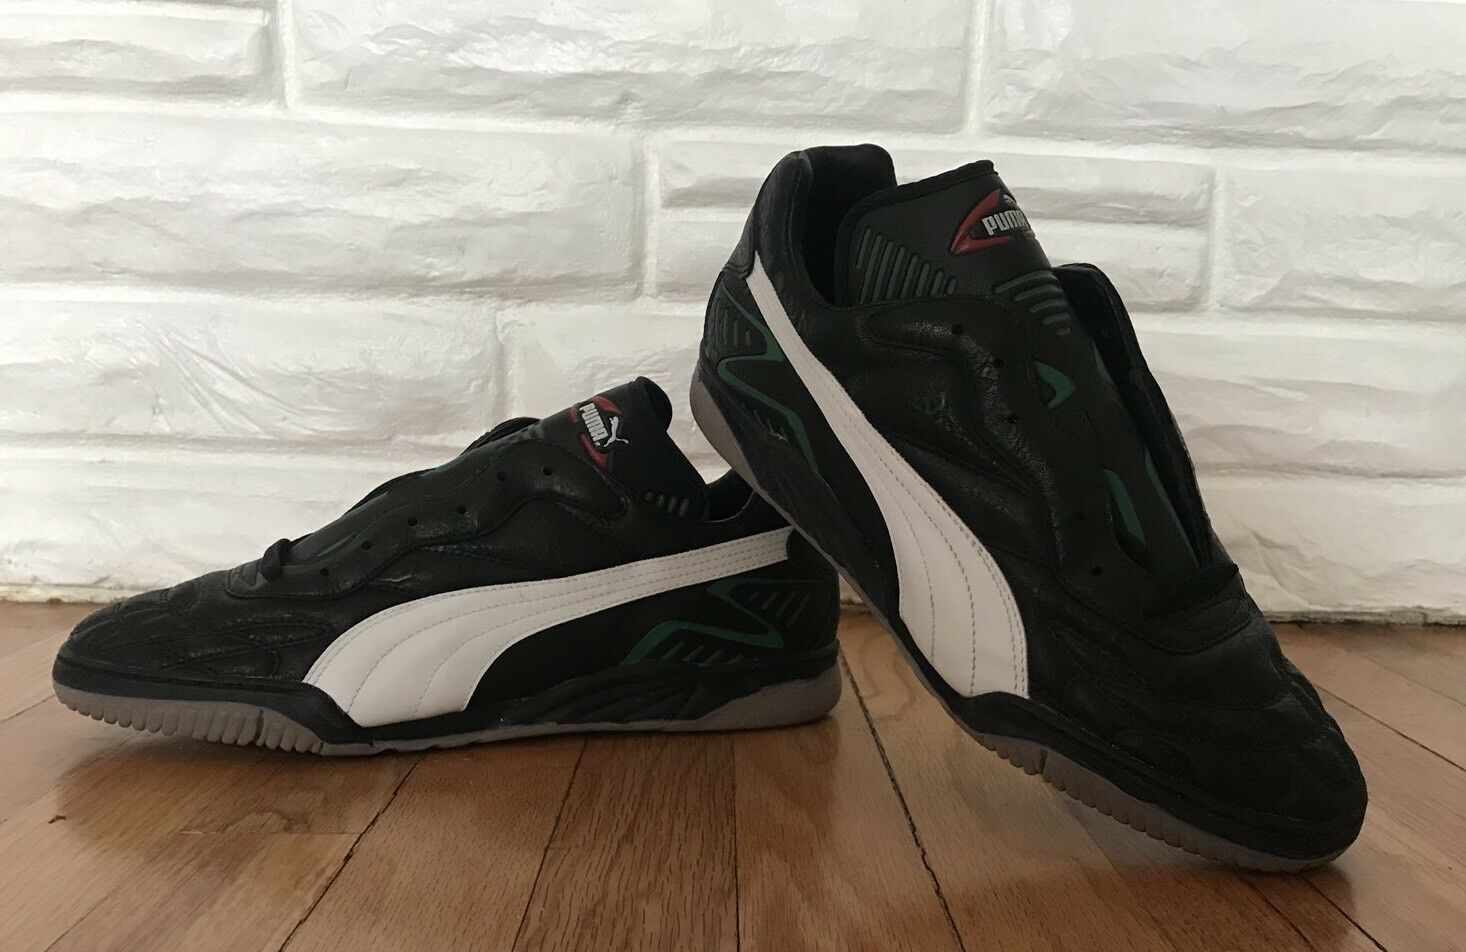 Vintage Puma Mens Torceira ? Indoor Soccer Shoes Black Size 11.5 New Deadstock